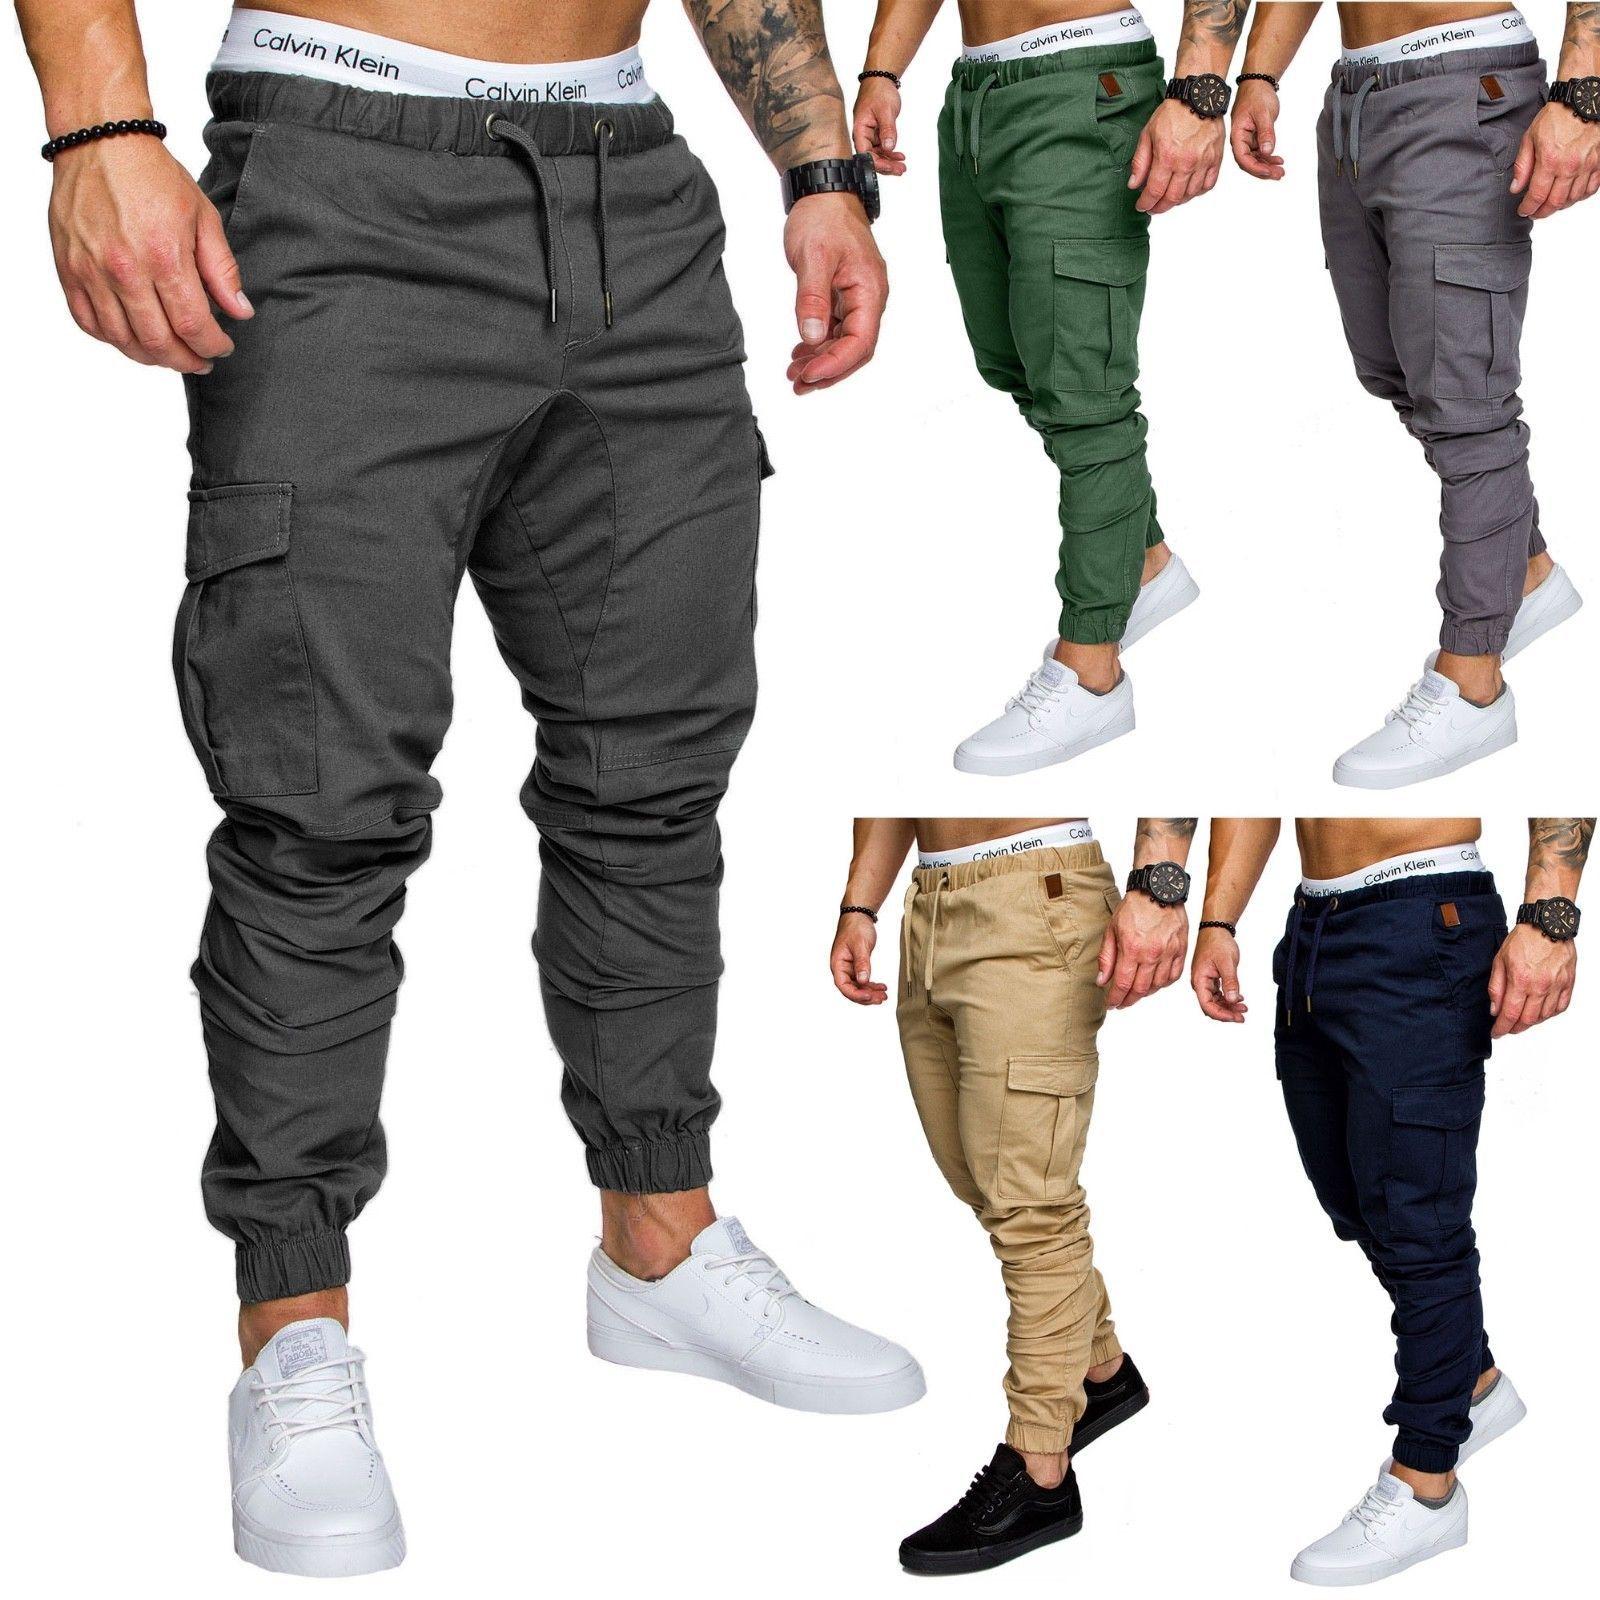 b4a28ed5826e4 2018 Ankle Banded Pants Men Big Pockets Upon American Street Pants ...